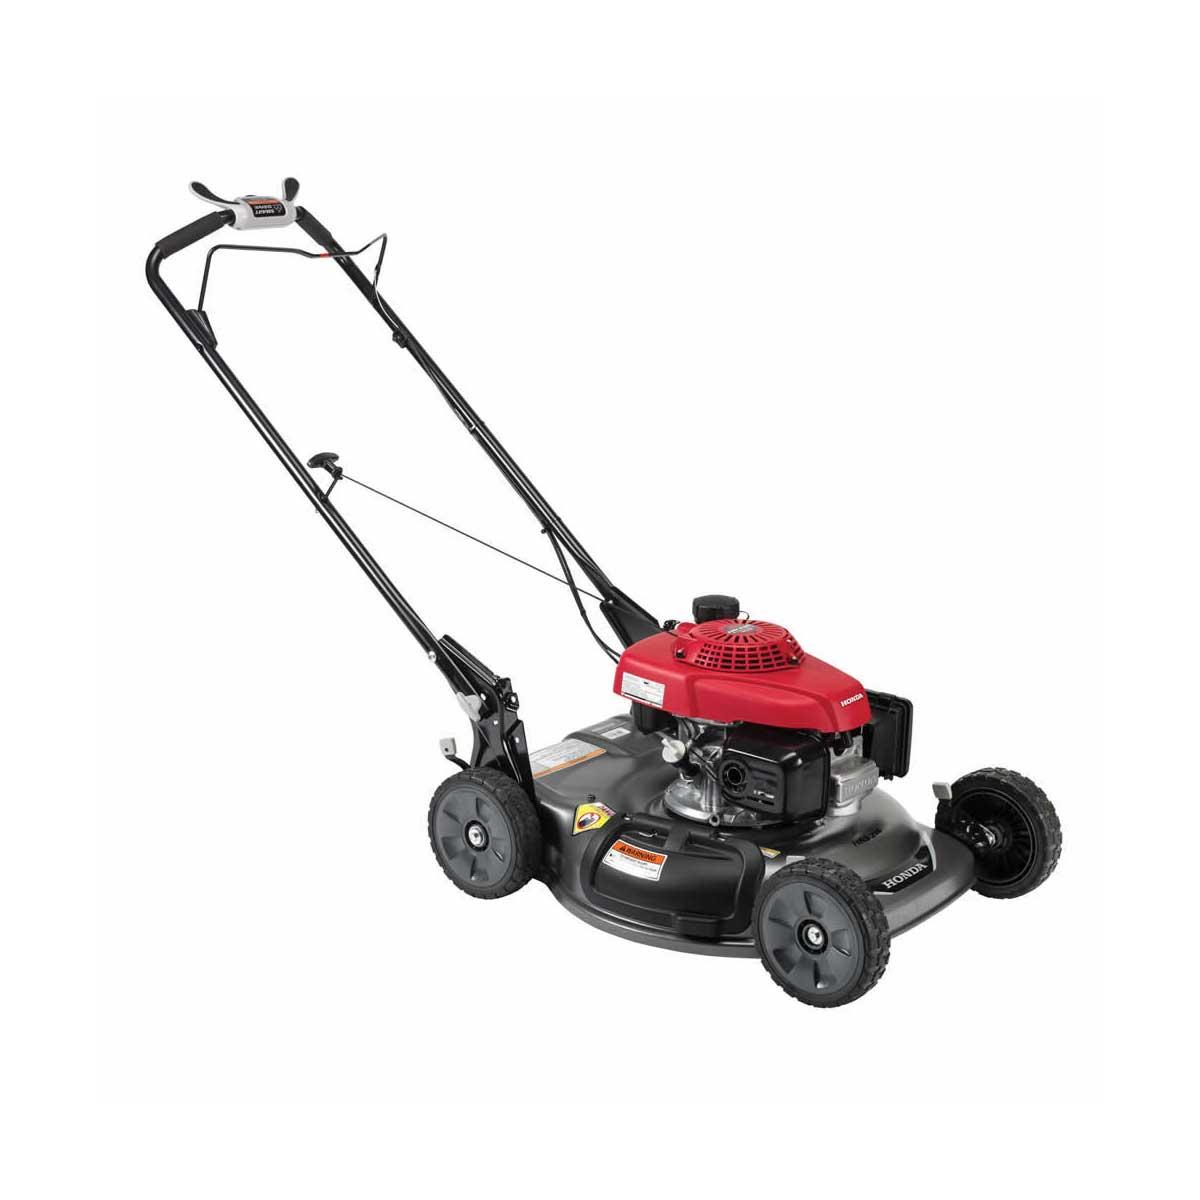 Honda Lawnmower HRS216VKA